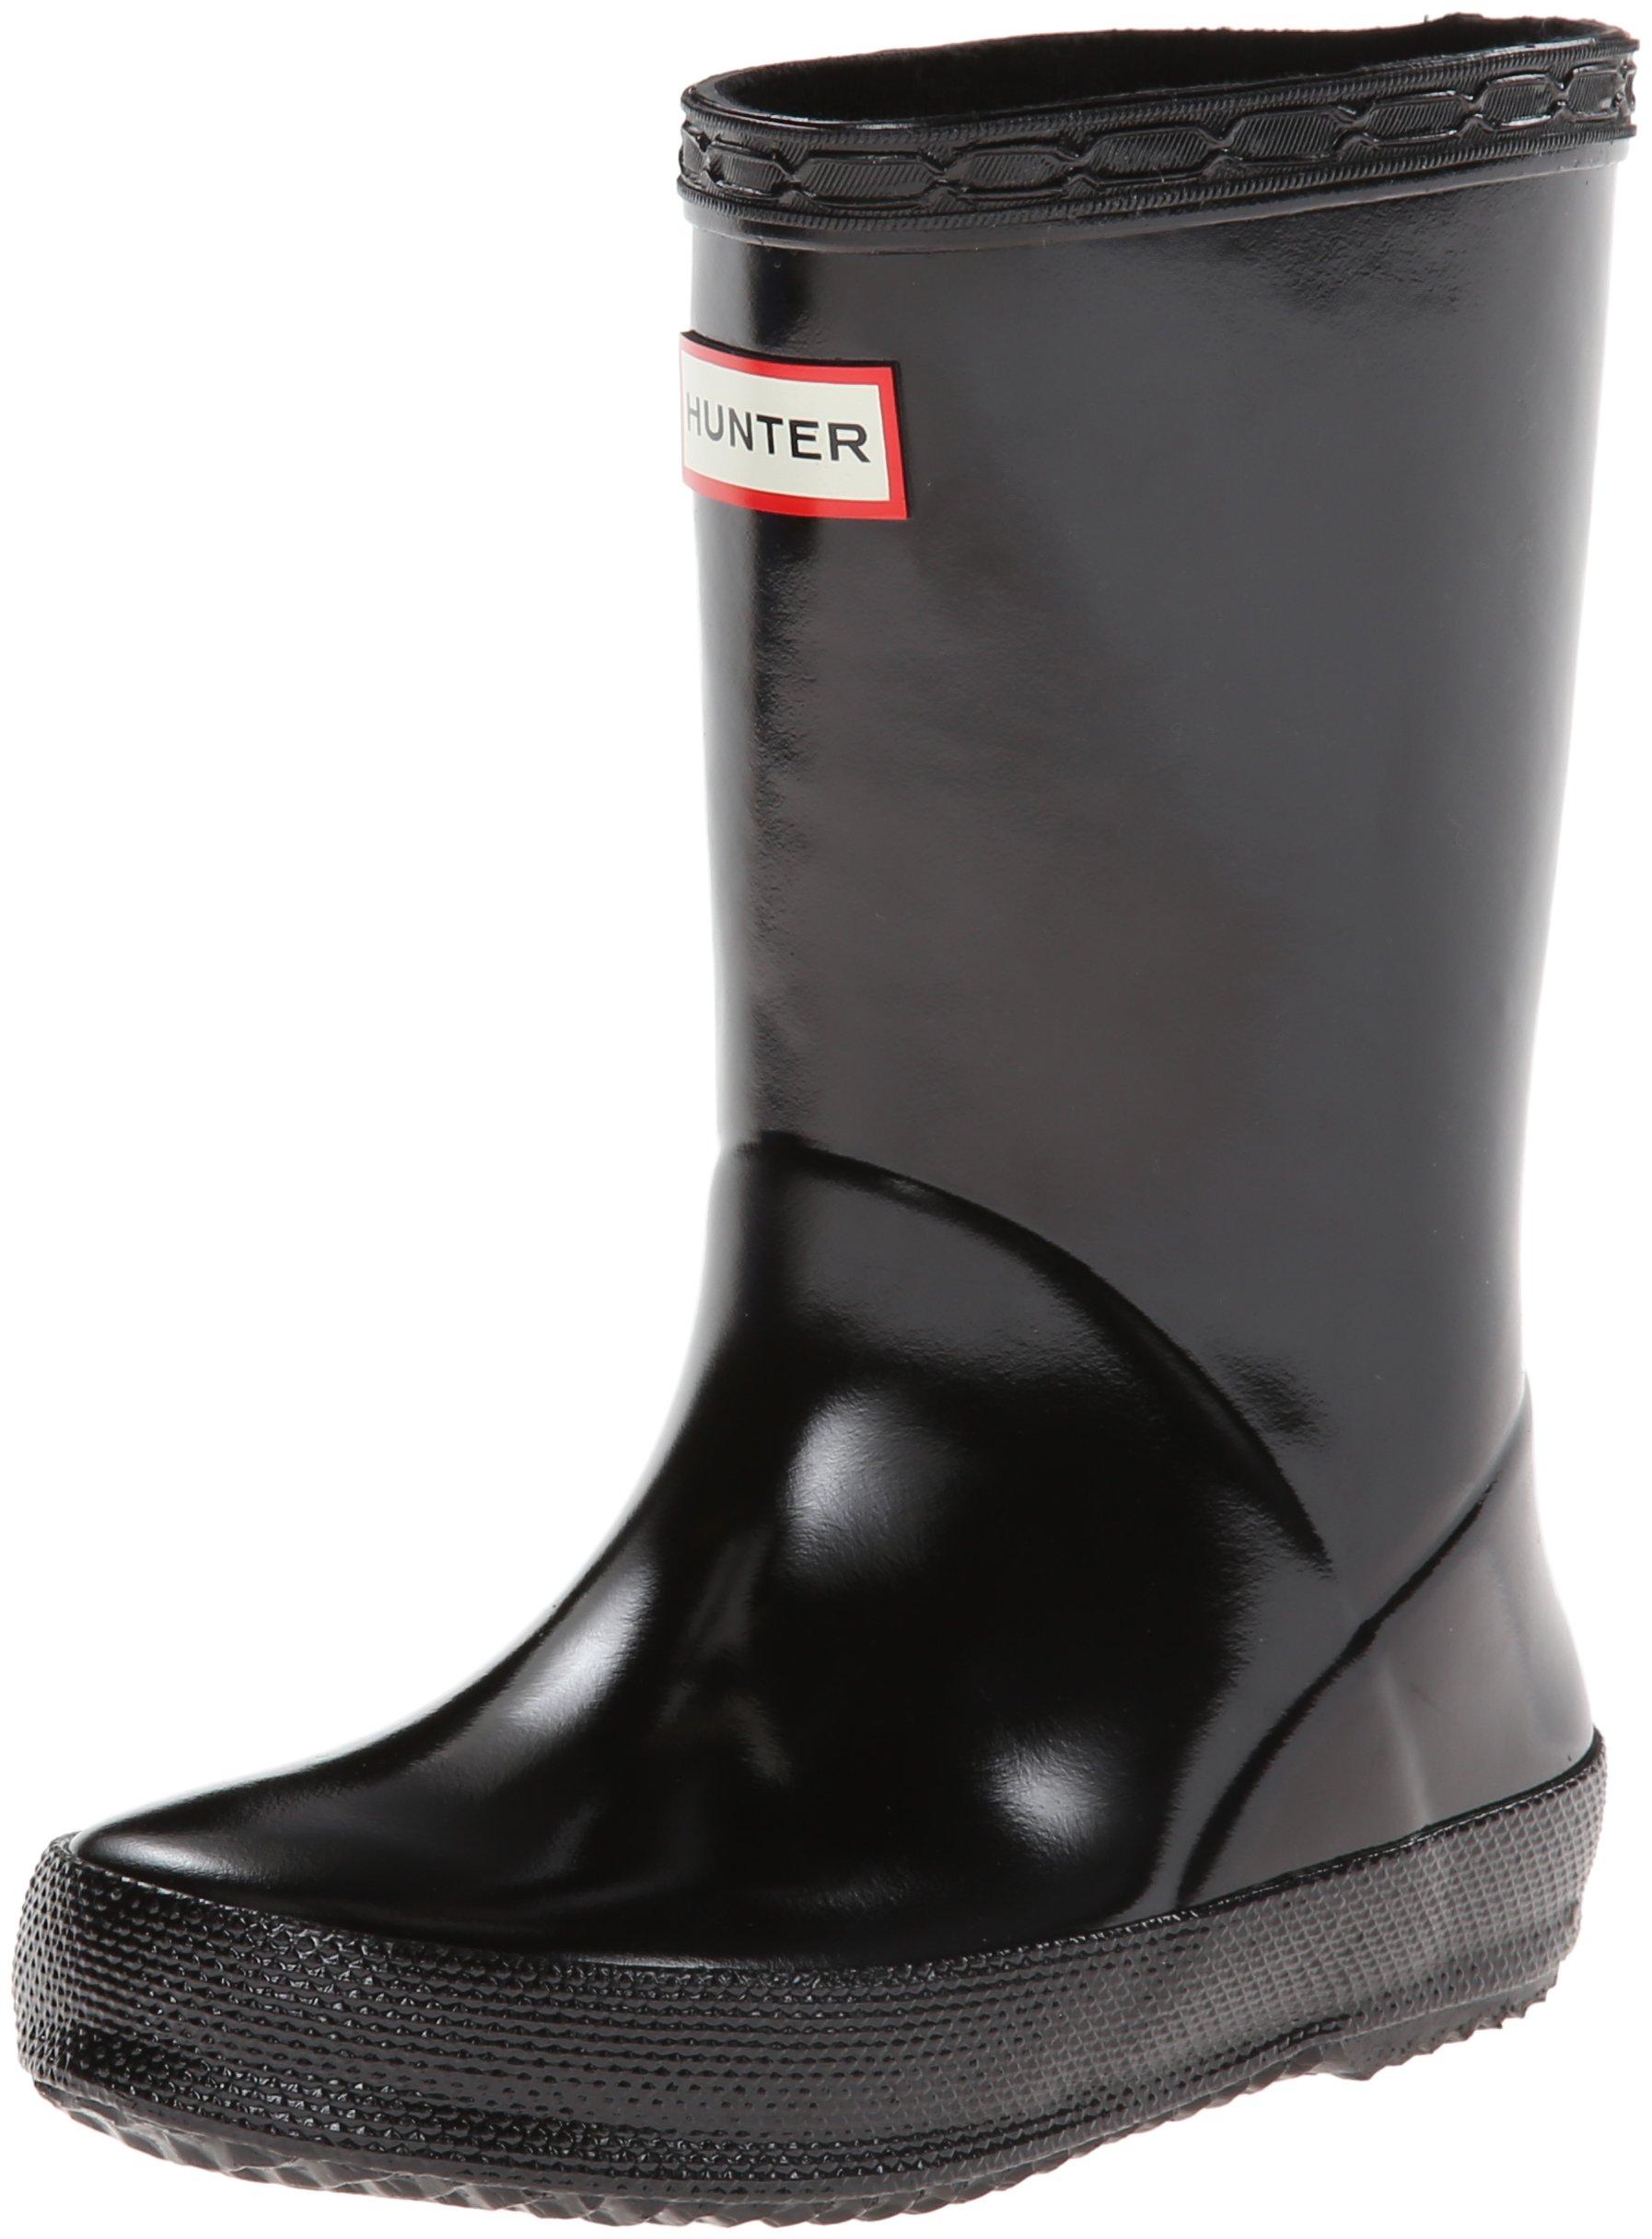 Hunter Kids Original Gloss Black Rain Boot - 2